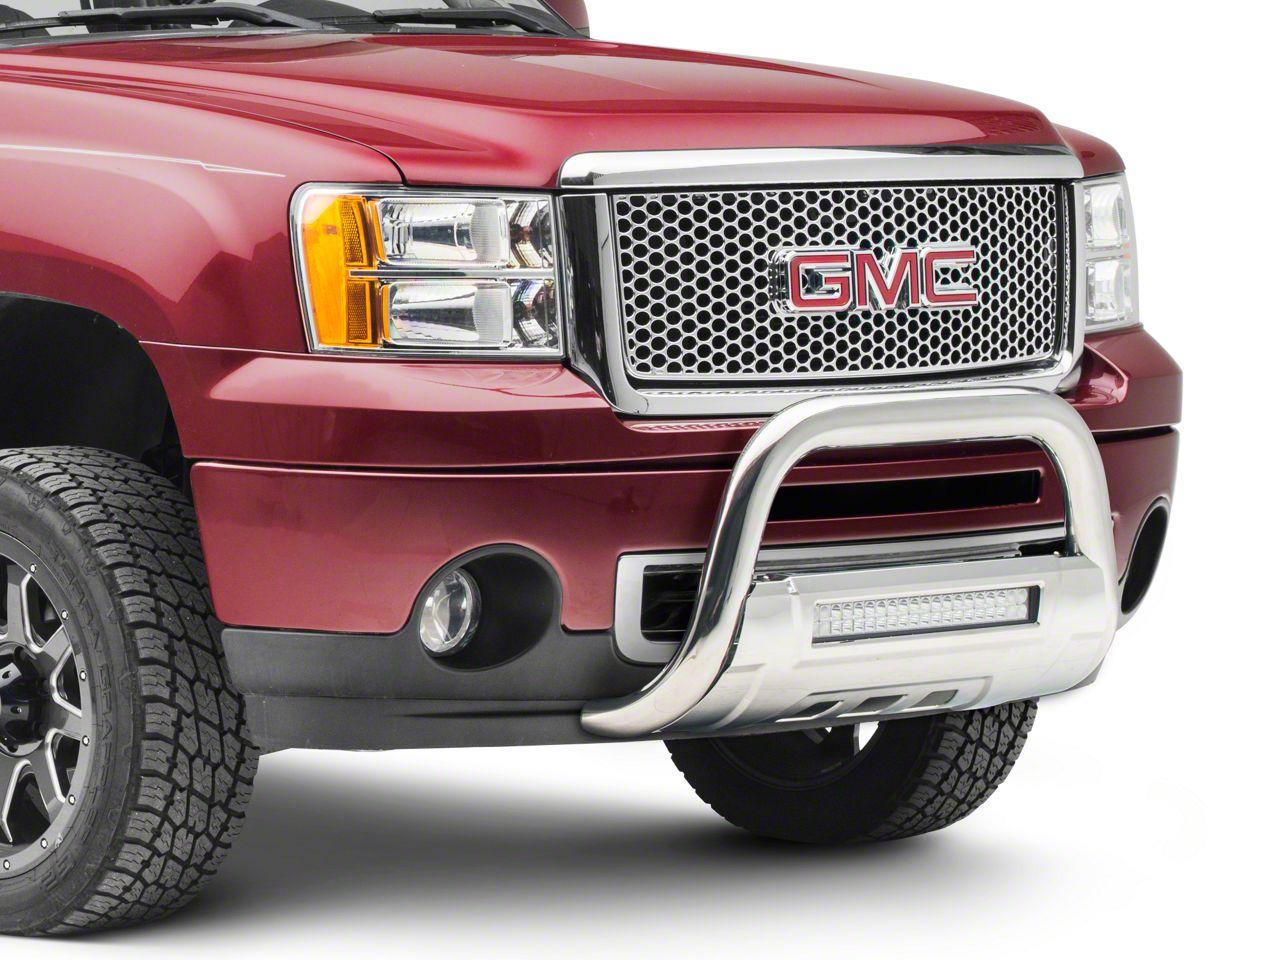 Barricade HD Bull Bar w/ Skid Plate & 20 in. LED Dual-Row LED Light Bar - Polished SS (07-18 Sierra 1500)